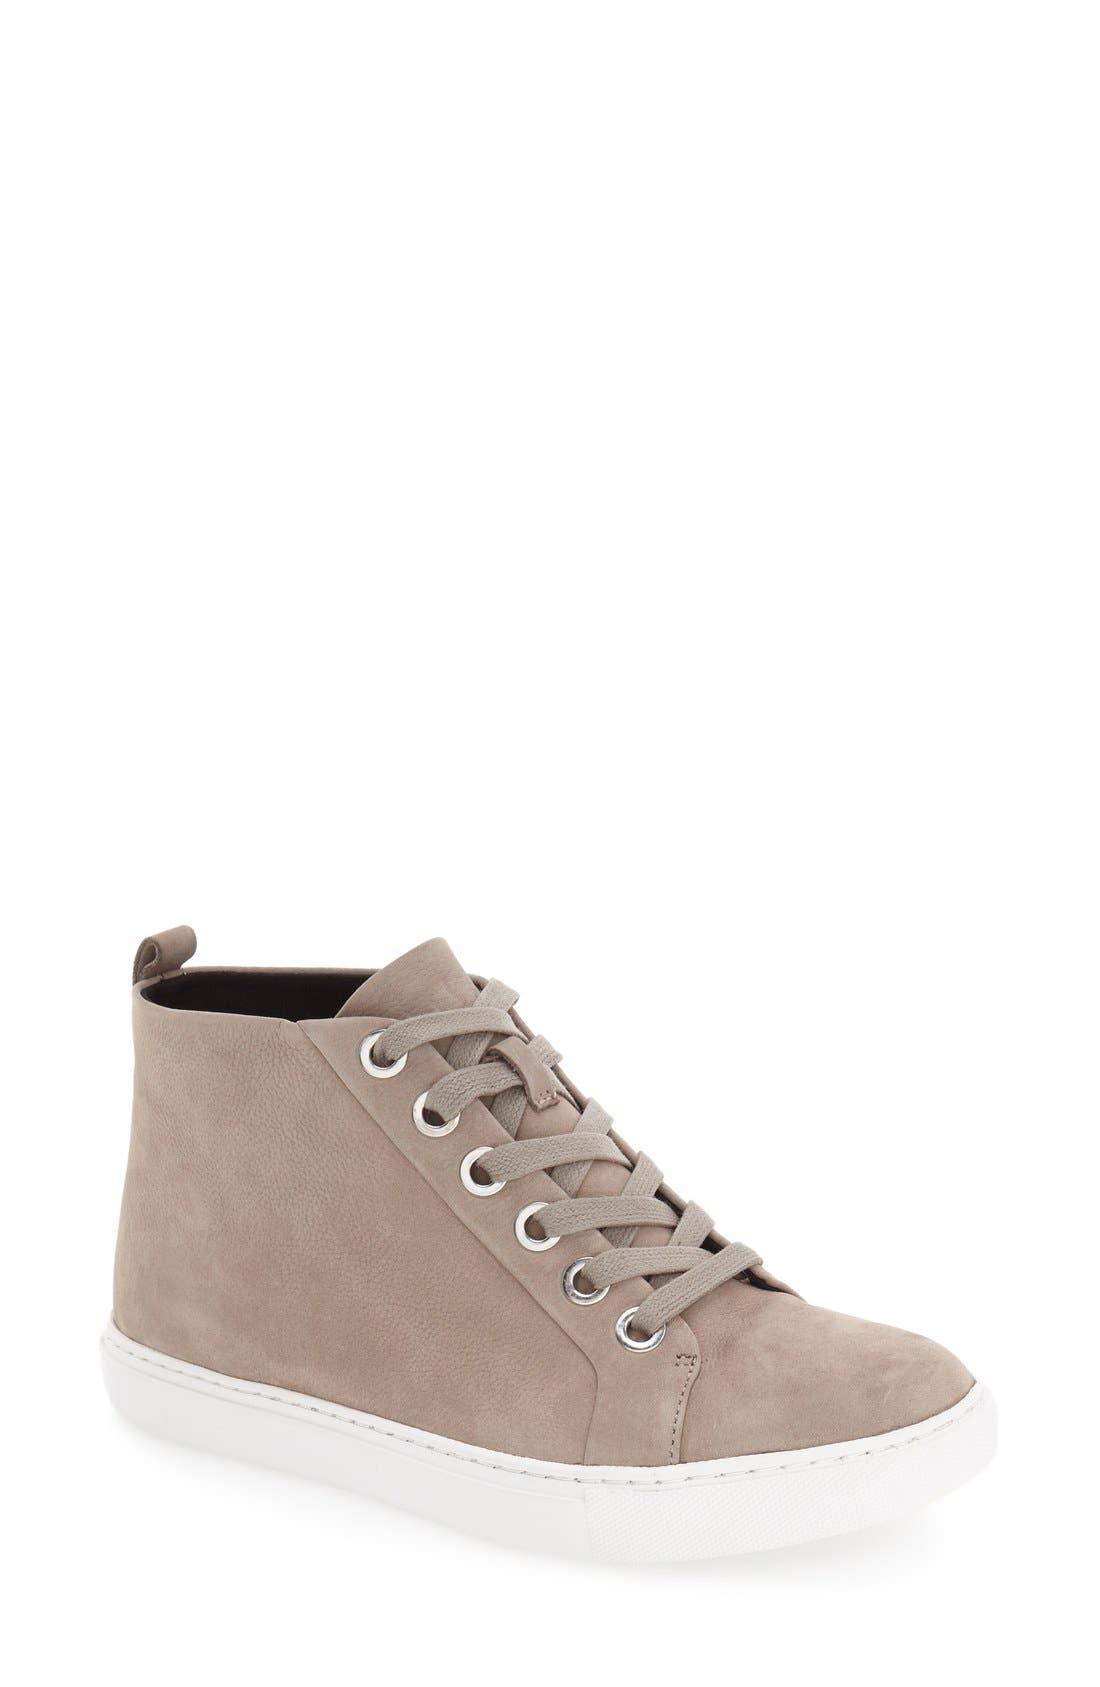 'Kaleb' High Top Sneaker,                             Main thumbnail 1, color,                             Cloud Nubuck Leather